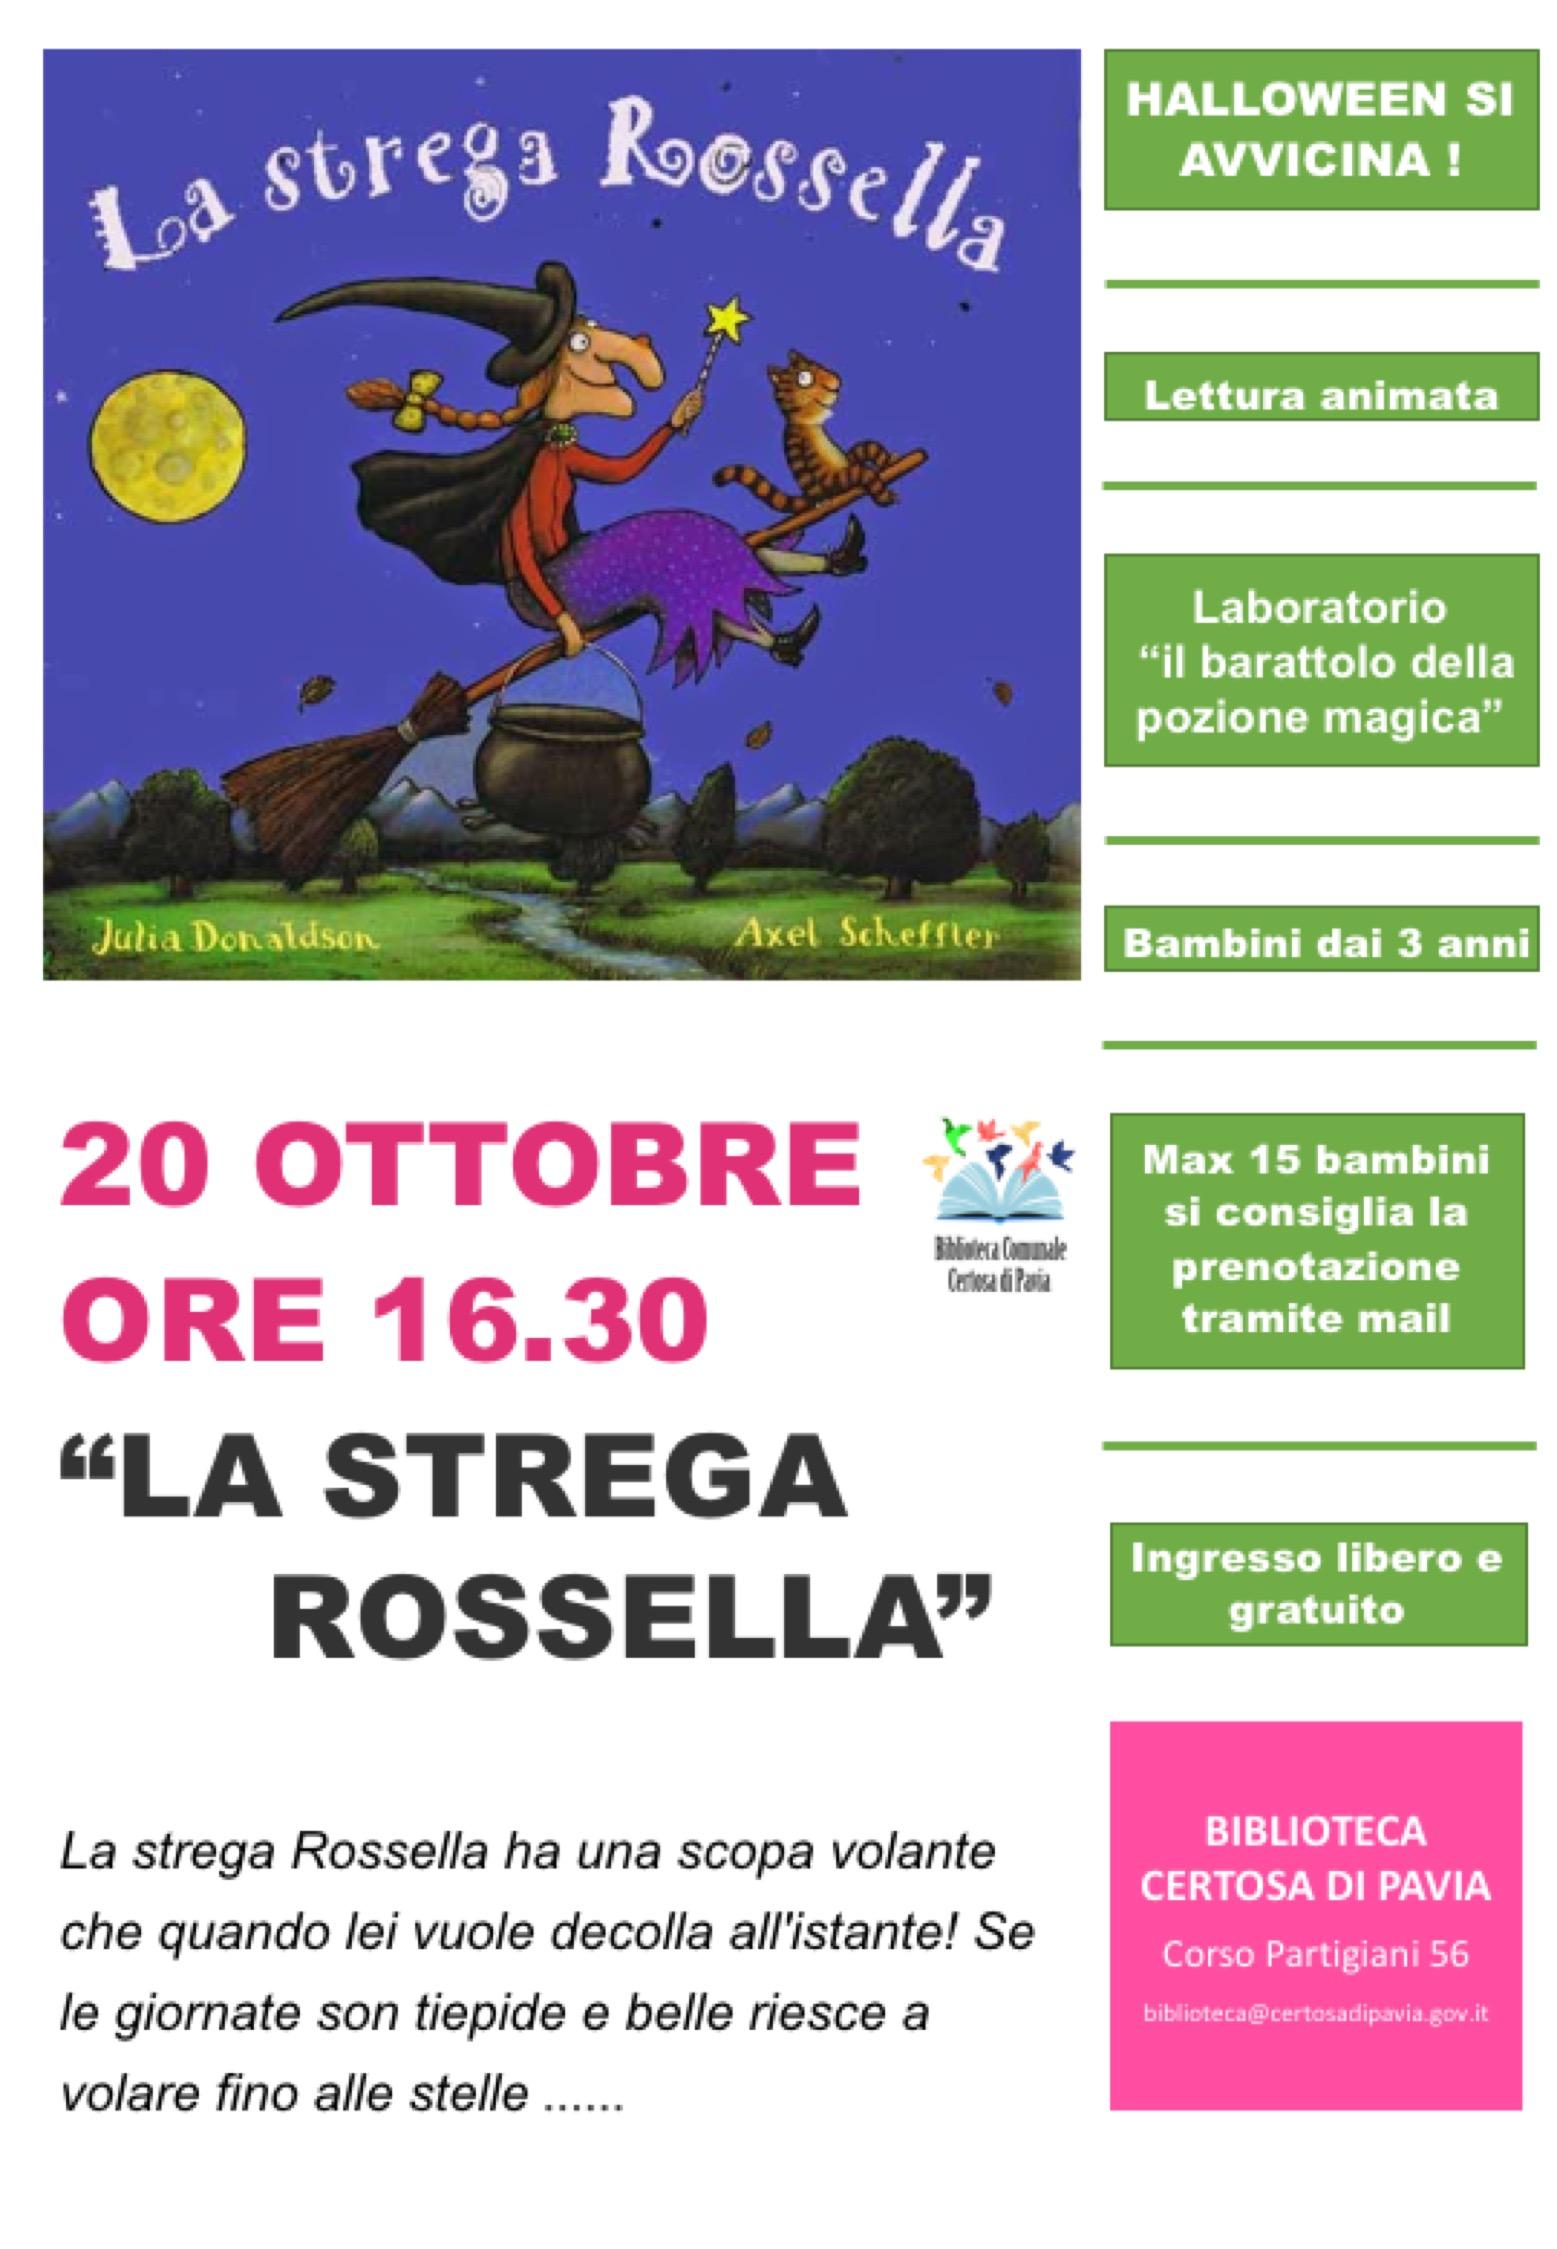 La Strega Rossella 20 ottobre 2018